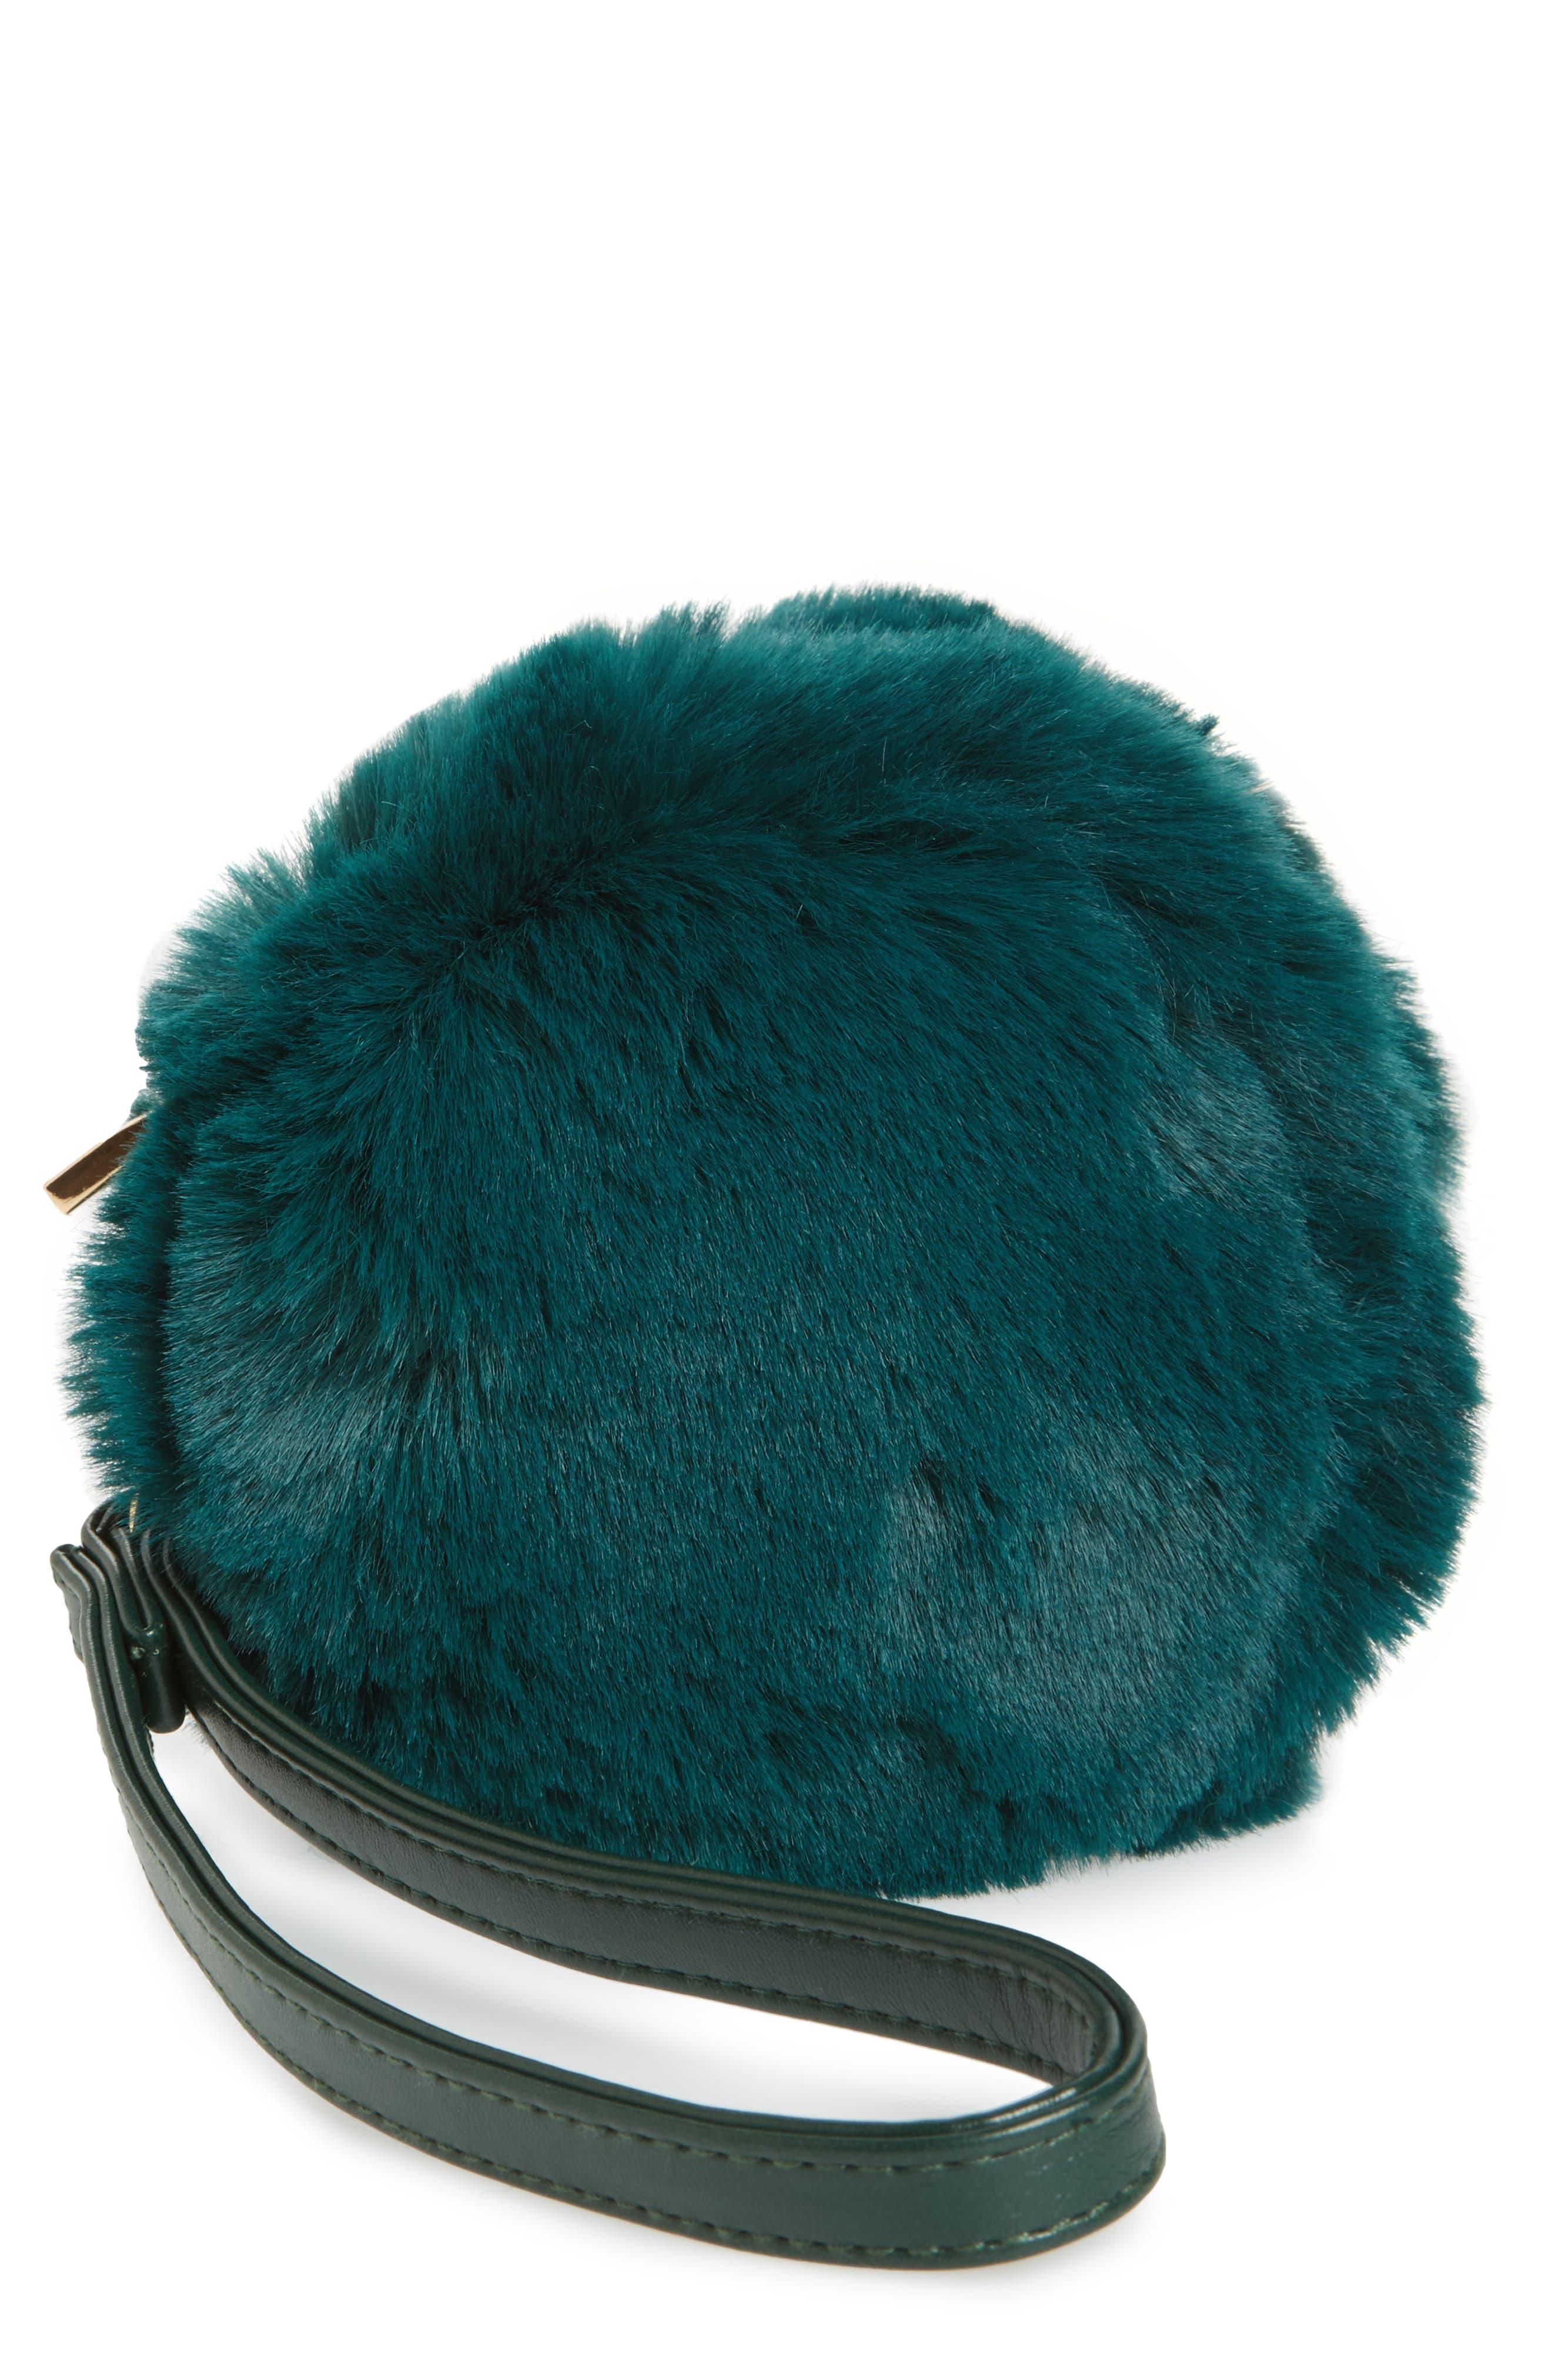 Macaron Faux Fur Wristlet,                         Main,                         color, Green